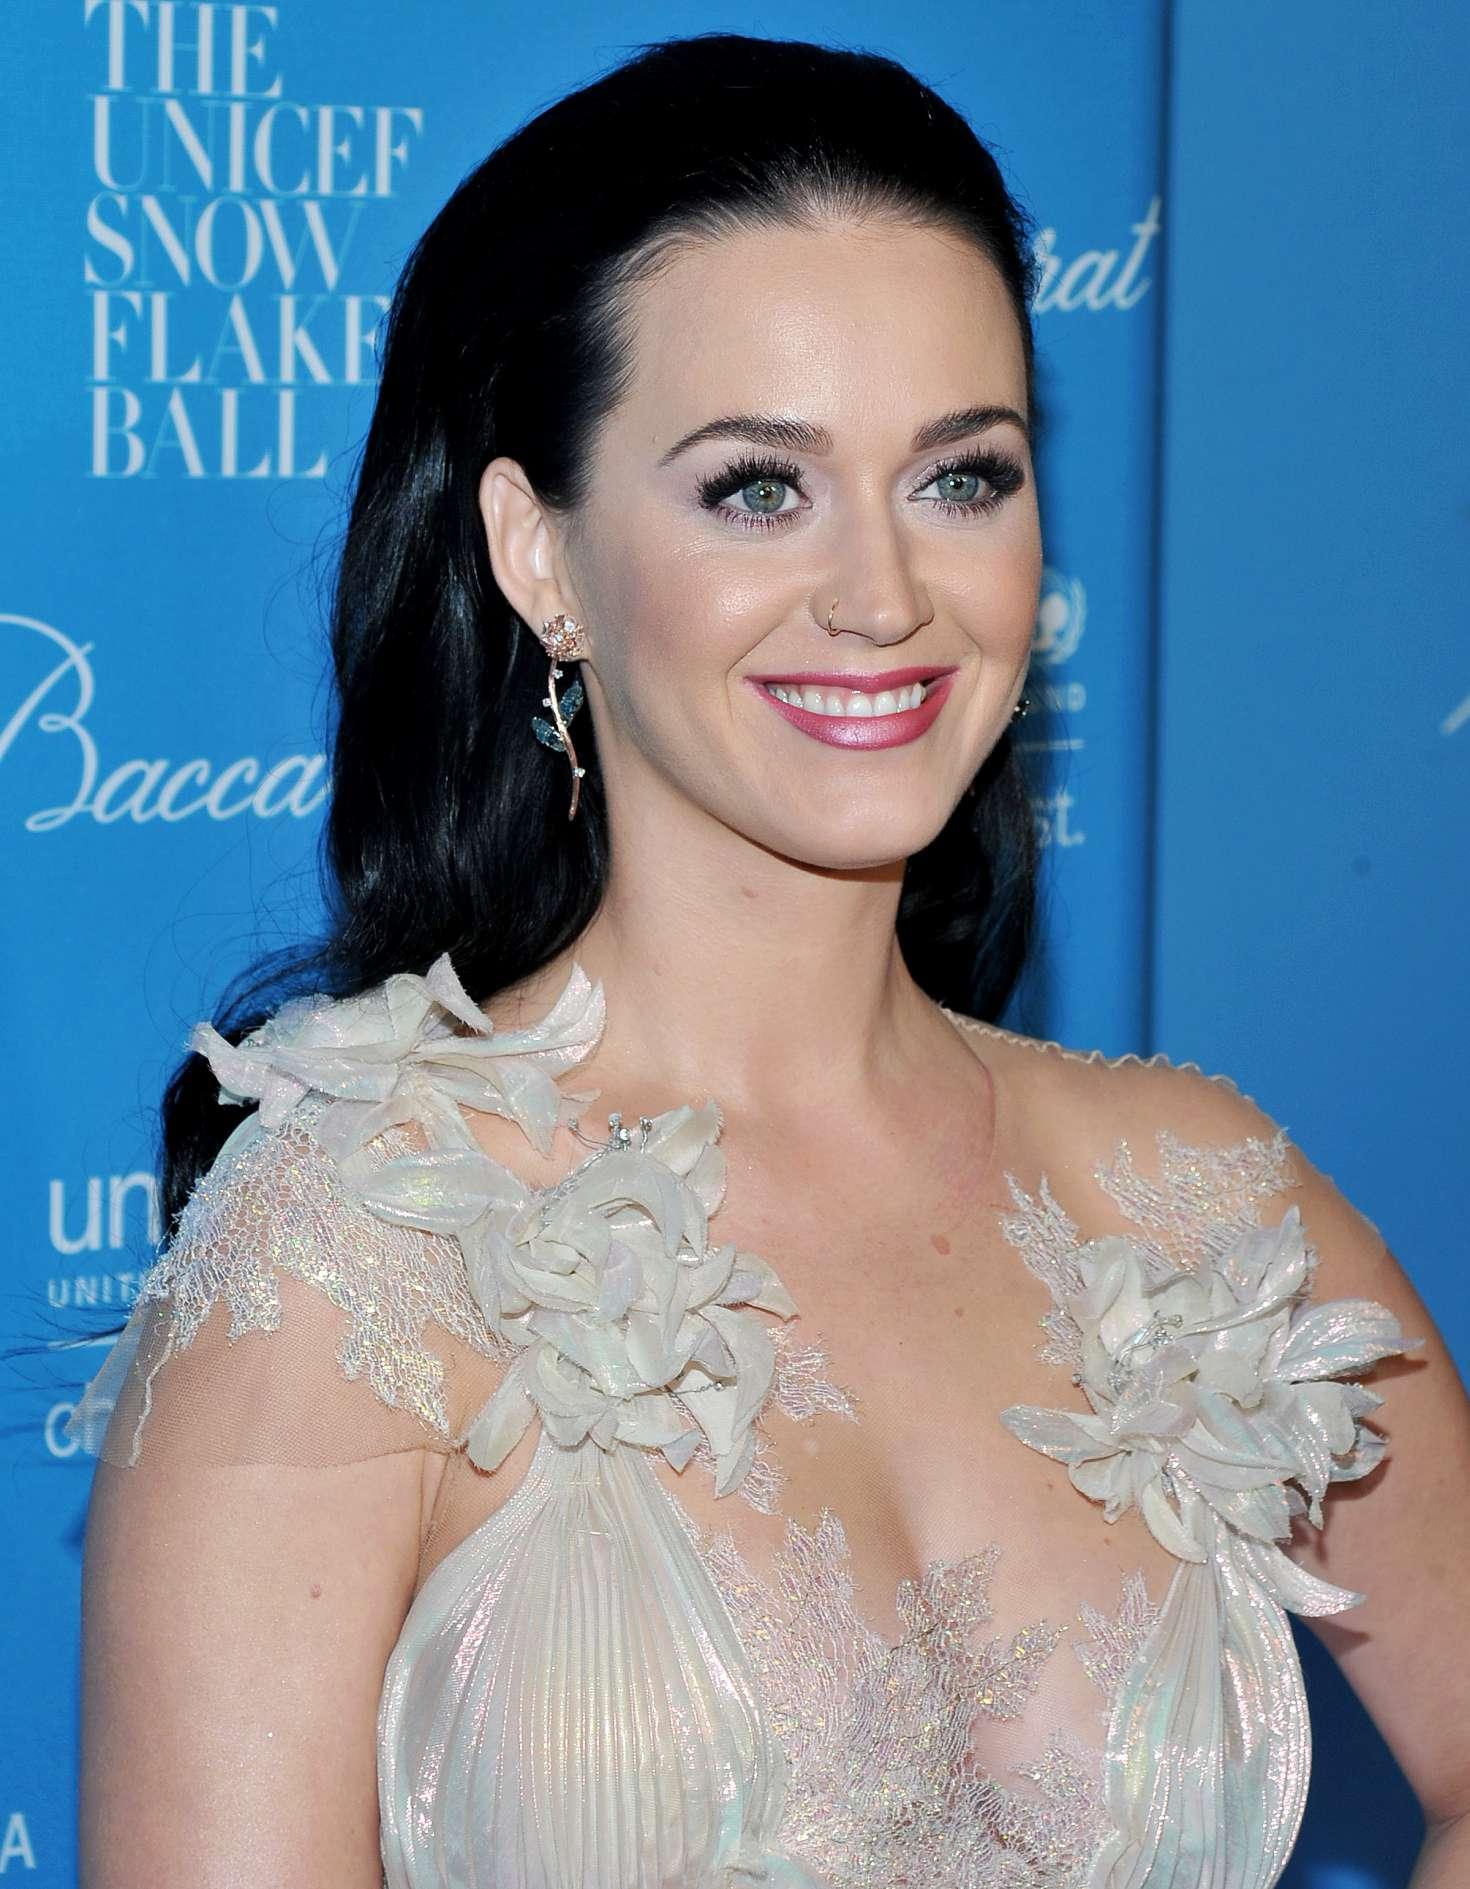 Katy Perry: 2016 UNICE... Katy Perry